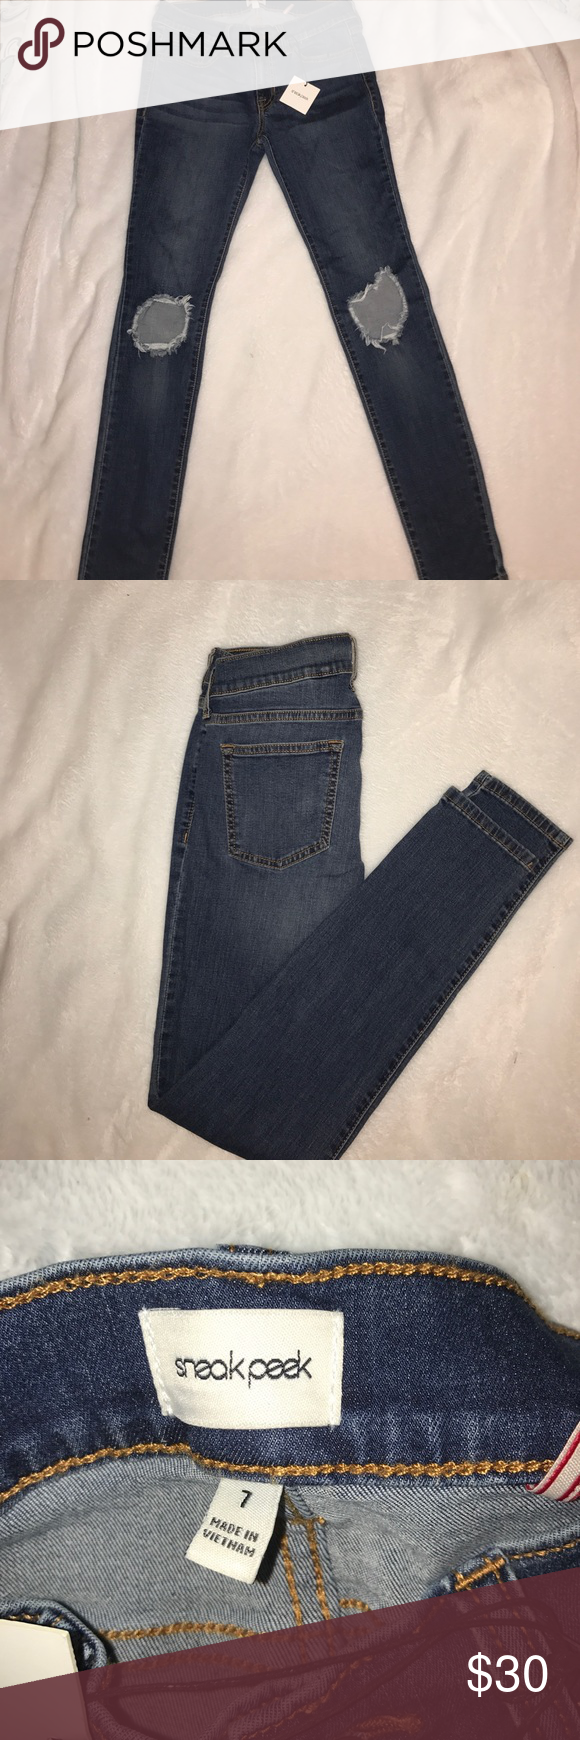 "Distressed skinny jeans Distressed med wash skinny jeans inseam 27"" Sneak peek Jeans Skinny"